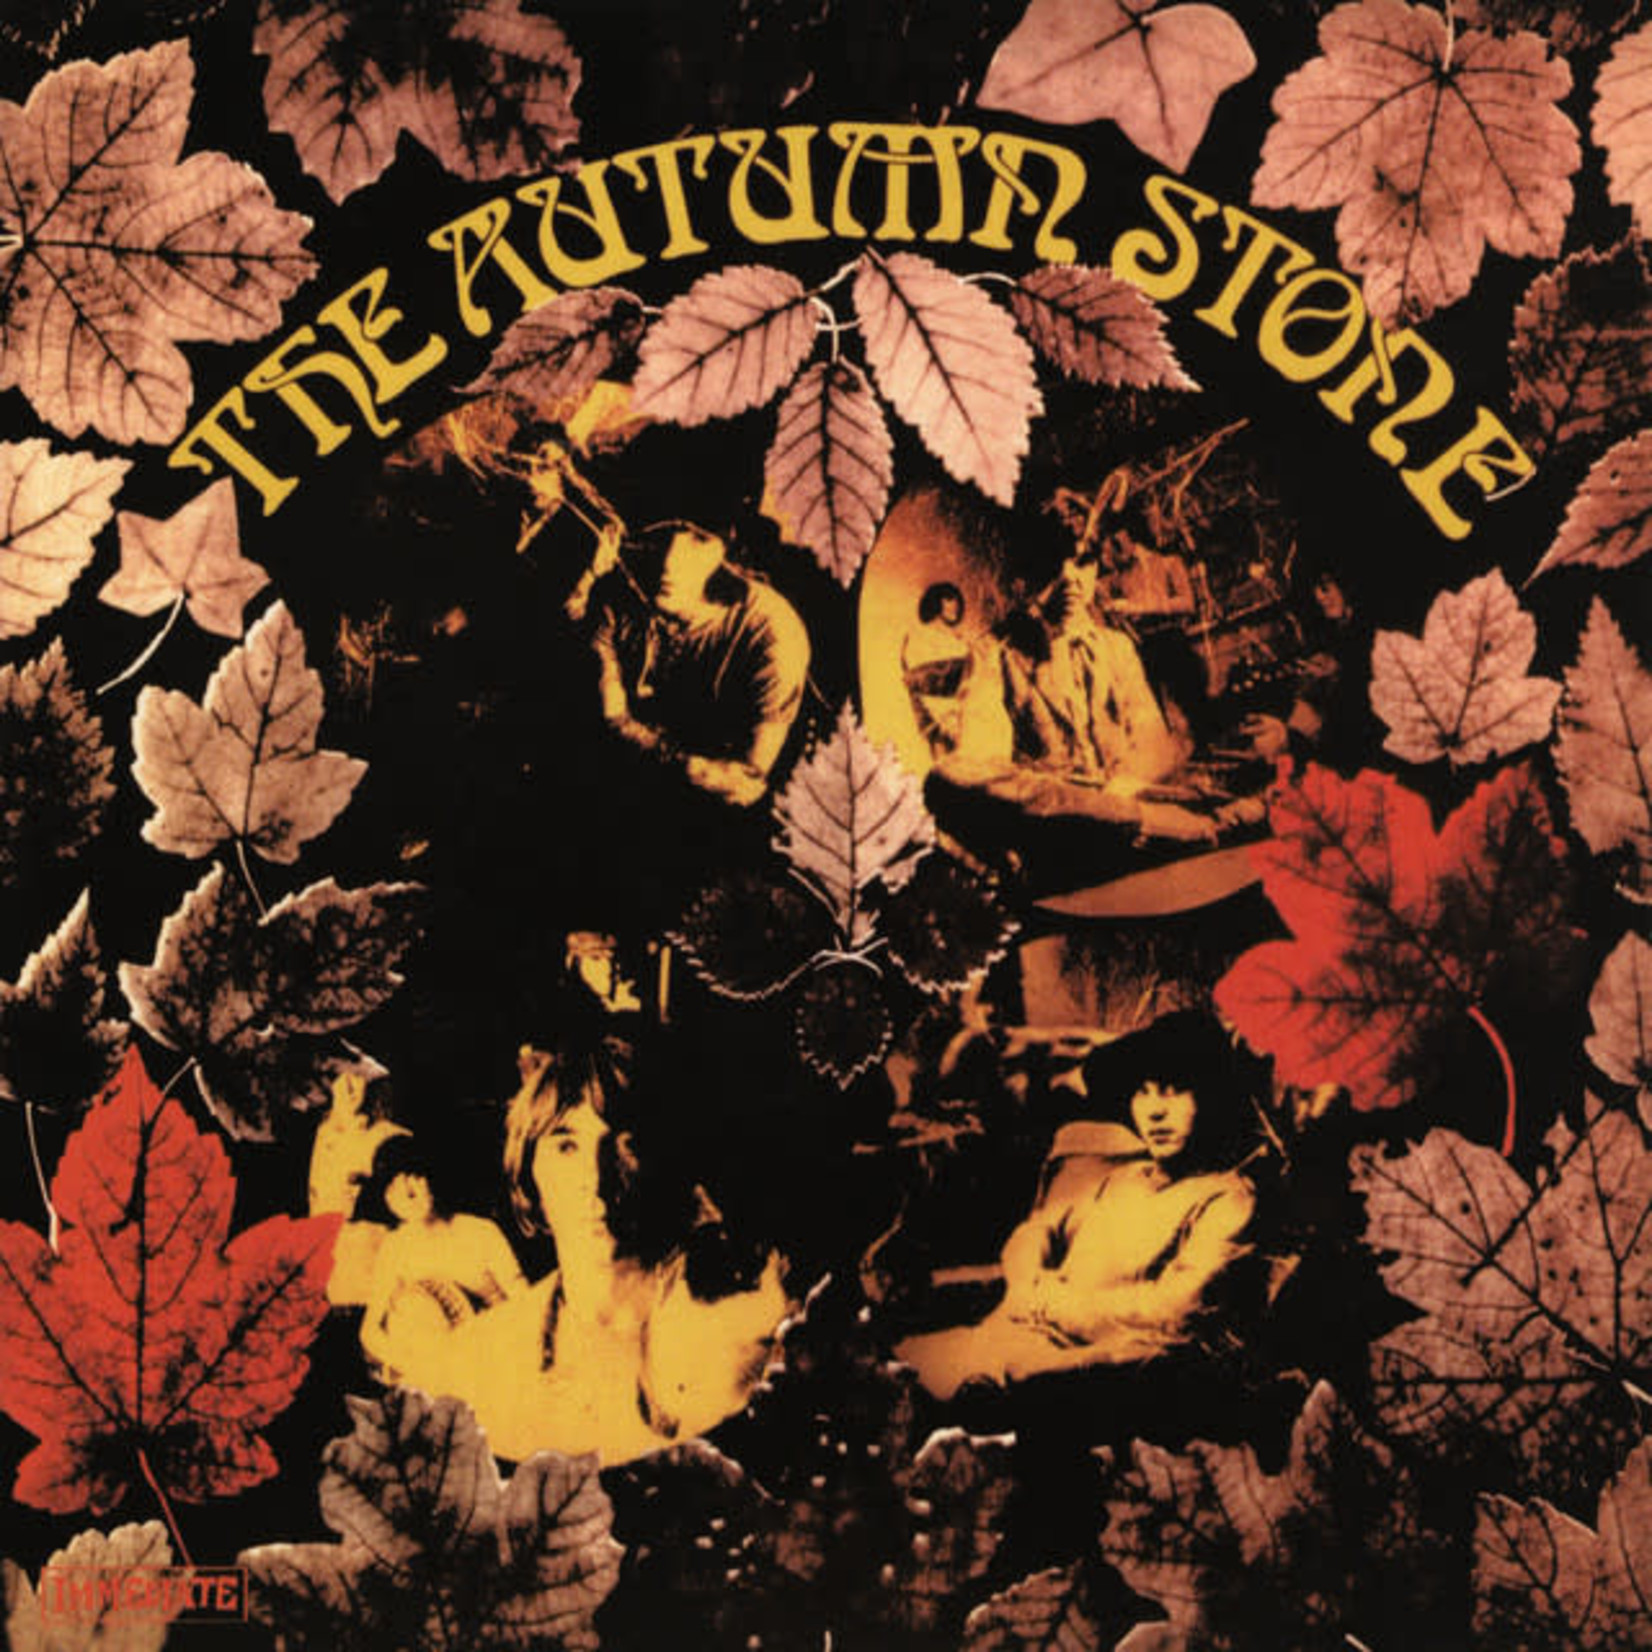 Vinyl Small Faces - The Autumn Stone